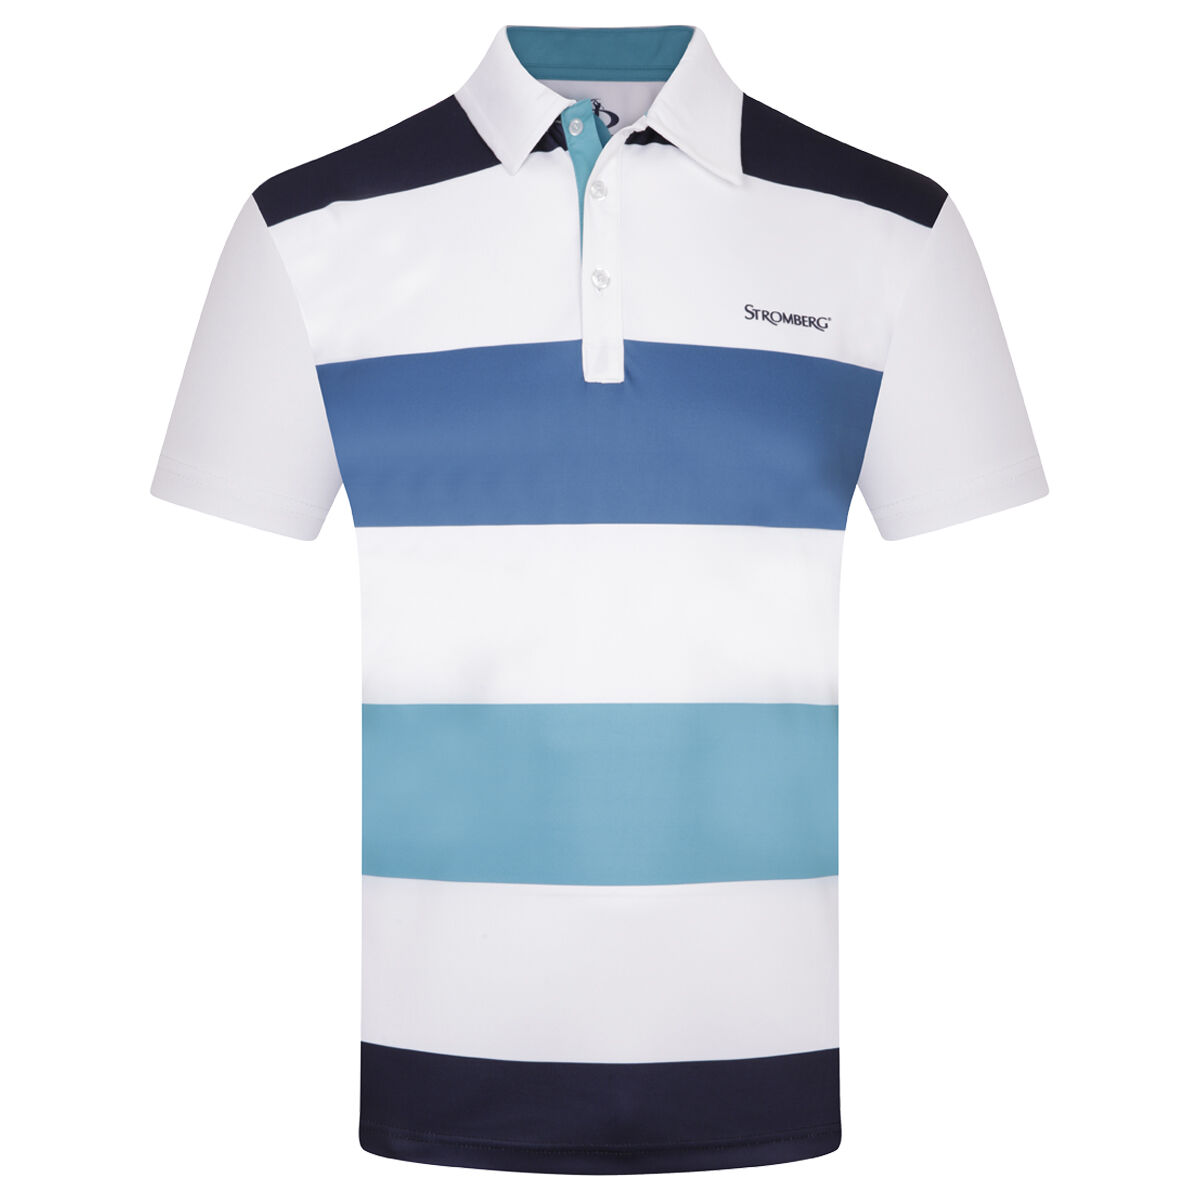 Stromberg Beat Stripe Golf Polo Shirt, Mens, White/navy, Large   American Golf